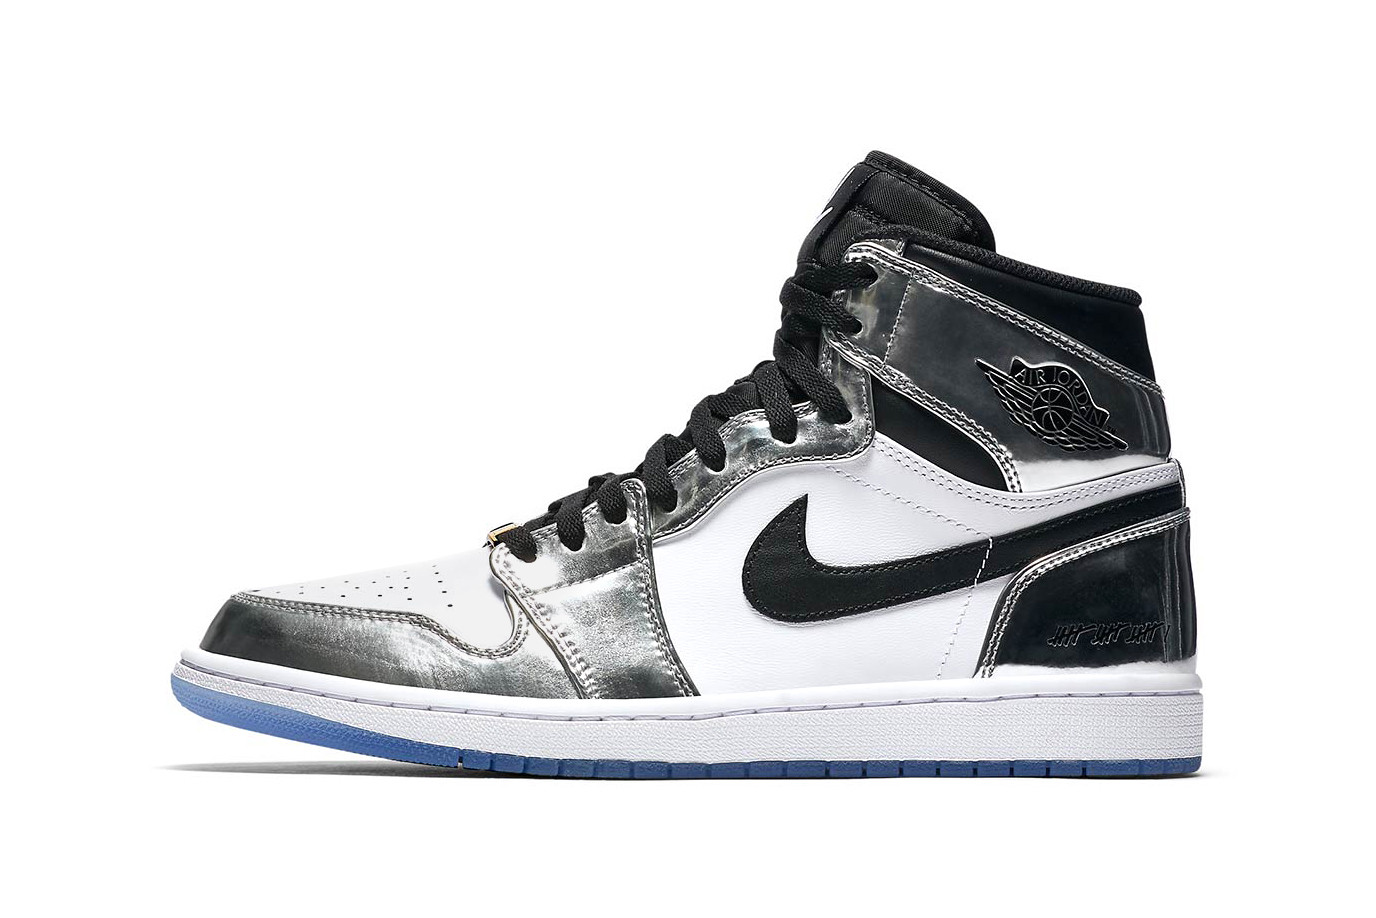 kawhi leonard jordan shoes